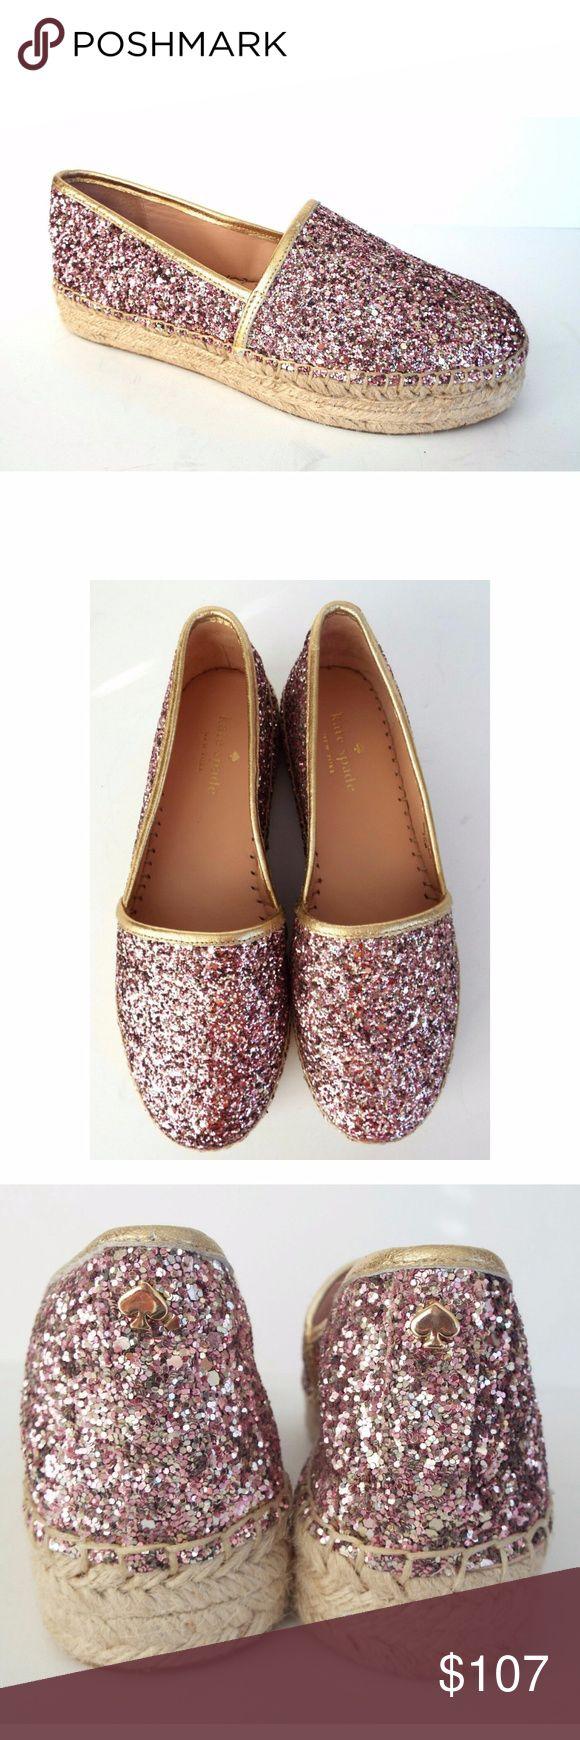 New KATE SPADE Size 7.5 LINDS Glitter Espadrille KATE SPADE 'Linds too rose' Pink/Purple Glitter Espadrilles Size 7 1/2 Medium New with Kate Spade box. kate spade Shoes Espadrilles